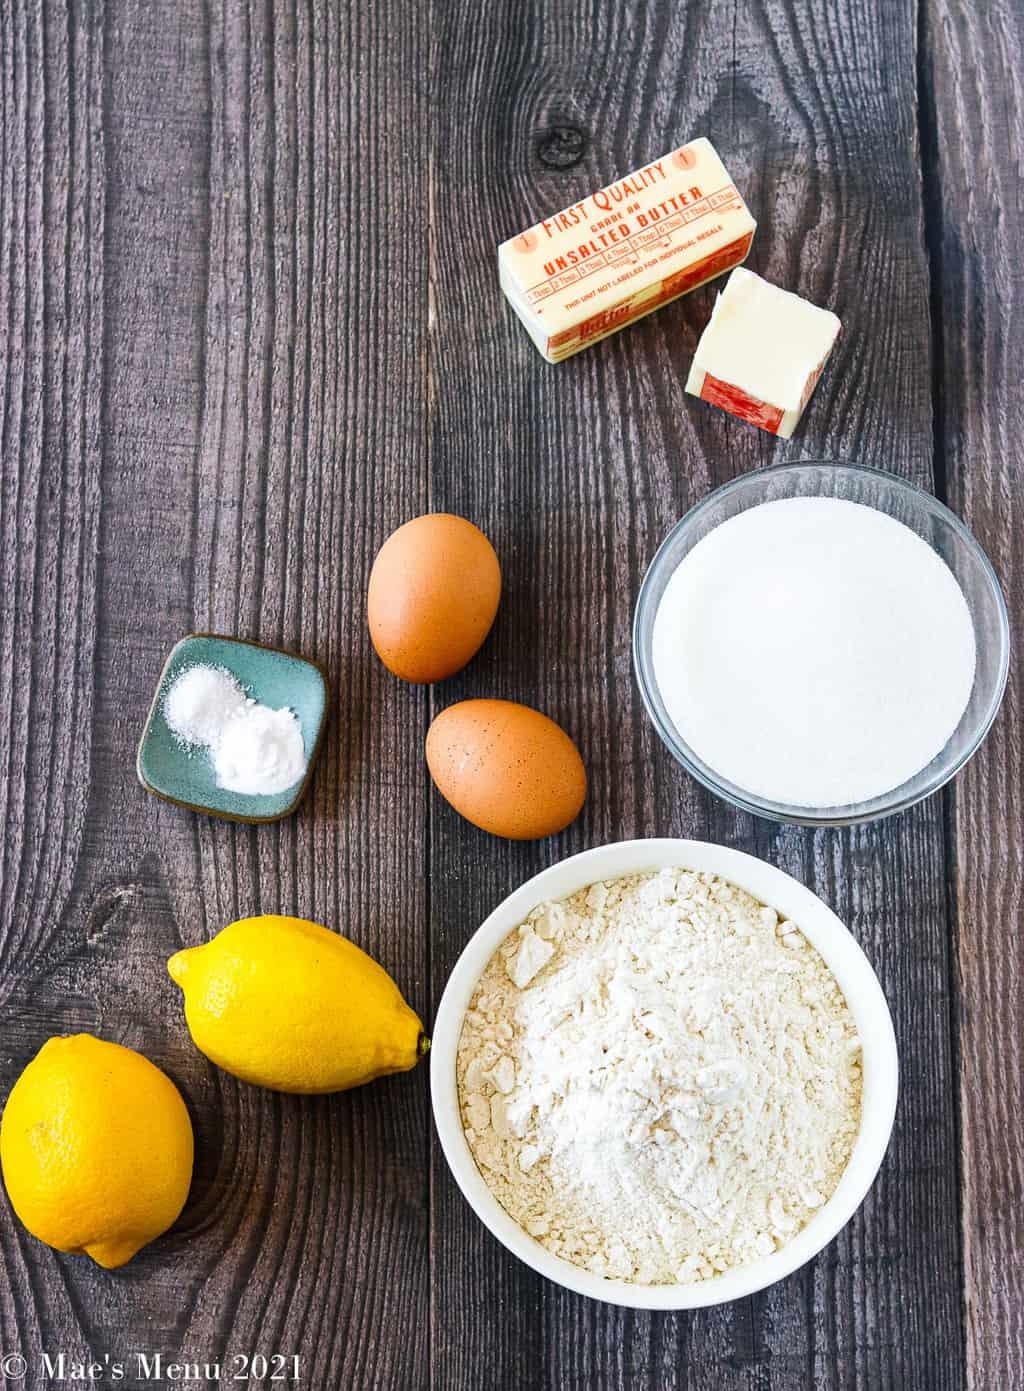 All of the ingredients for lemon sugar cookies: all purpose flour, lemons, eggs, baking soda, salt, sugar, and butter